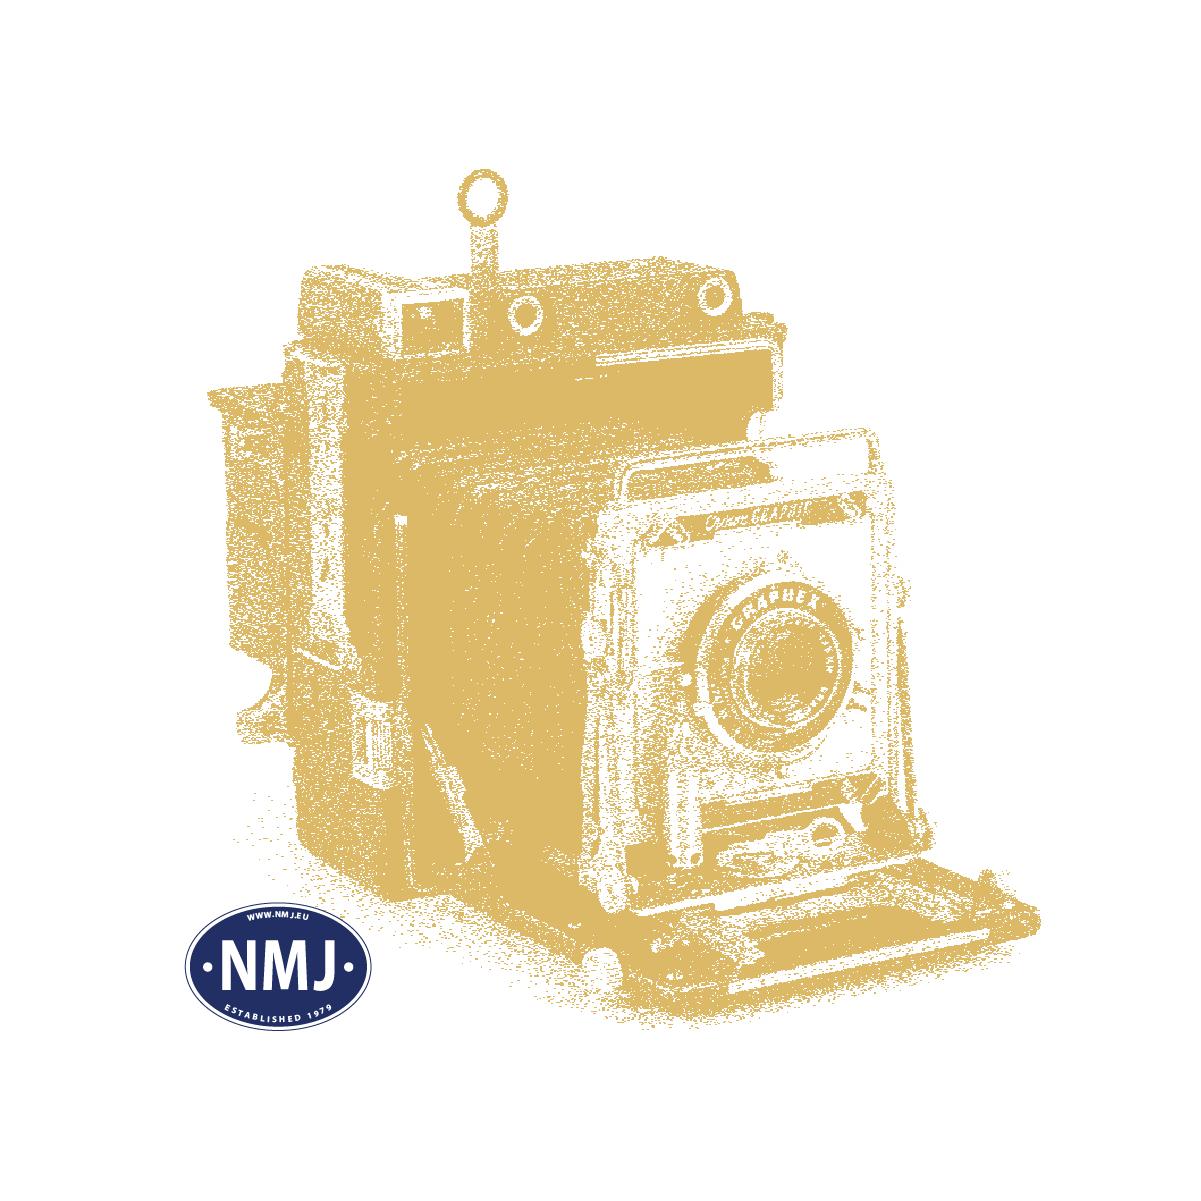 NMJSCDFO.3 - NMJ Superline Modell des CDFo type 2 Messing Ausführung der NSB